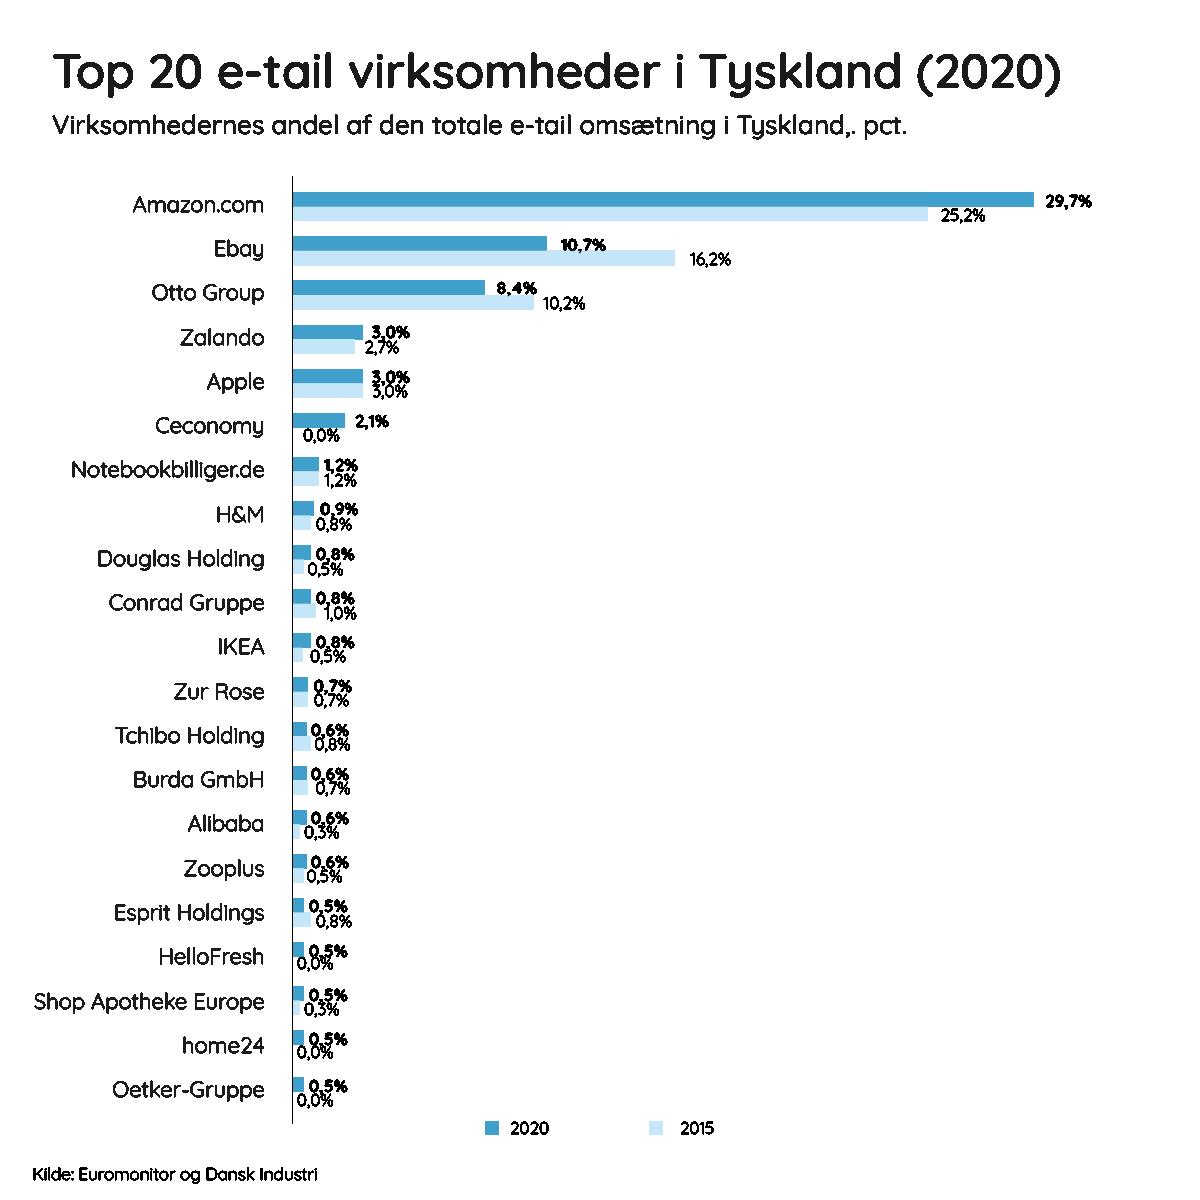 Tysk e-handel top 20 e-tail virksomheder i Tyskland